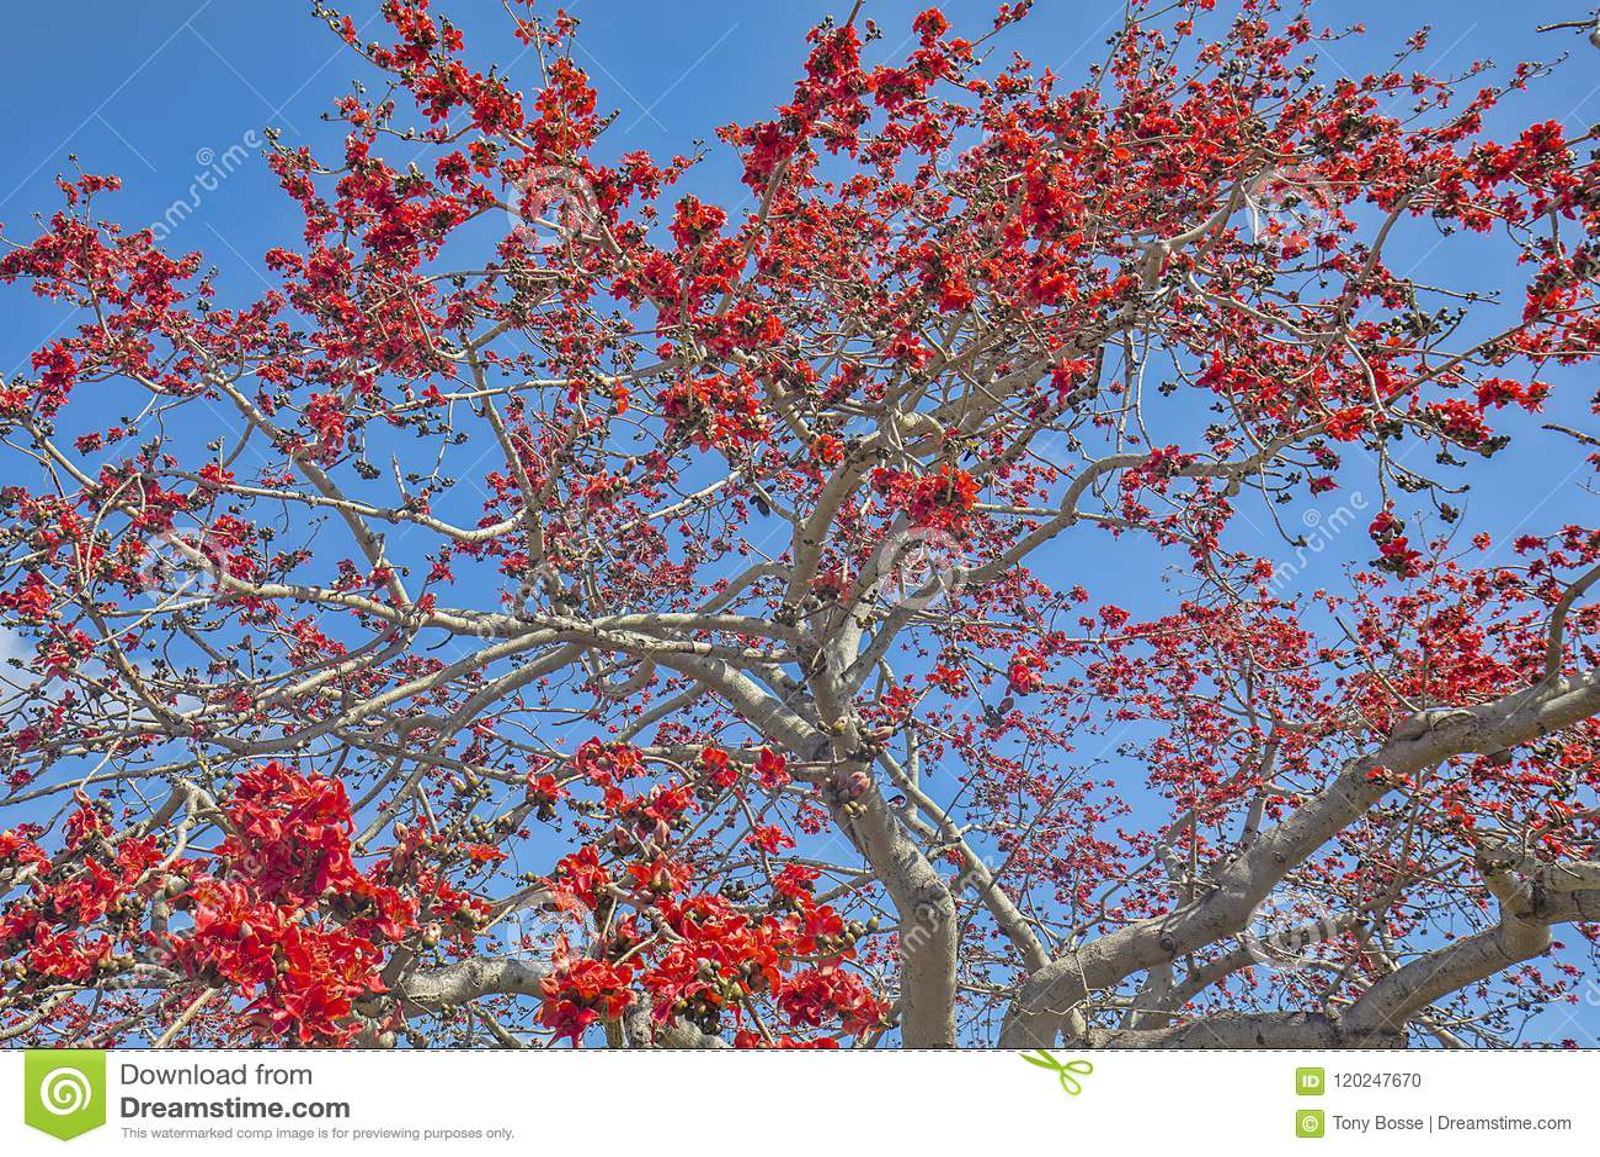 Kapok Tree In Full Bloom Background Stock Photo - Image of